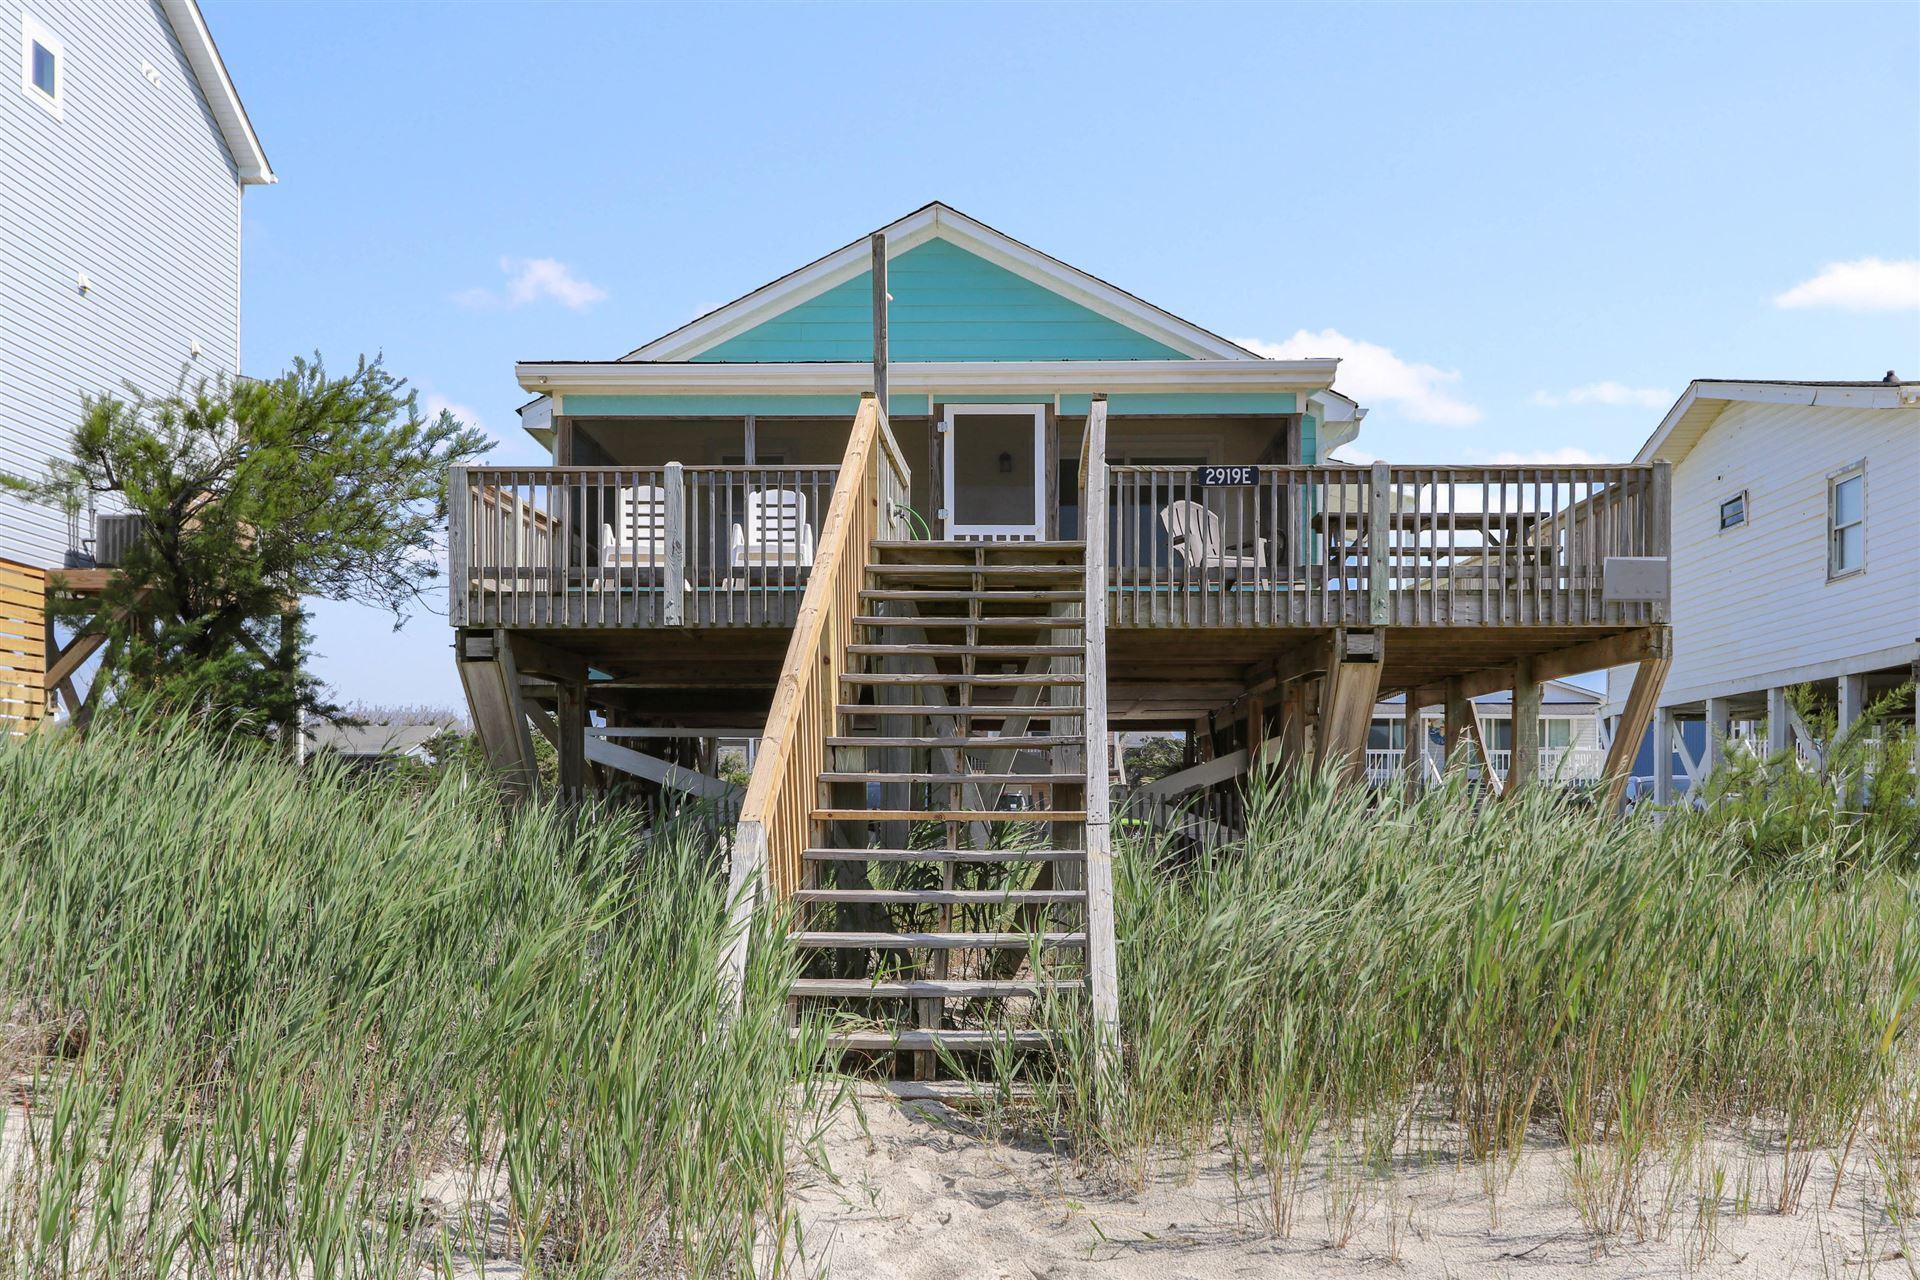 Photo for 2919 E Beach Drive, Oak Island, NC 28465 (MLS # 100268055)